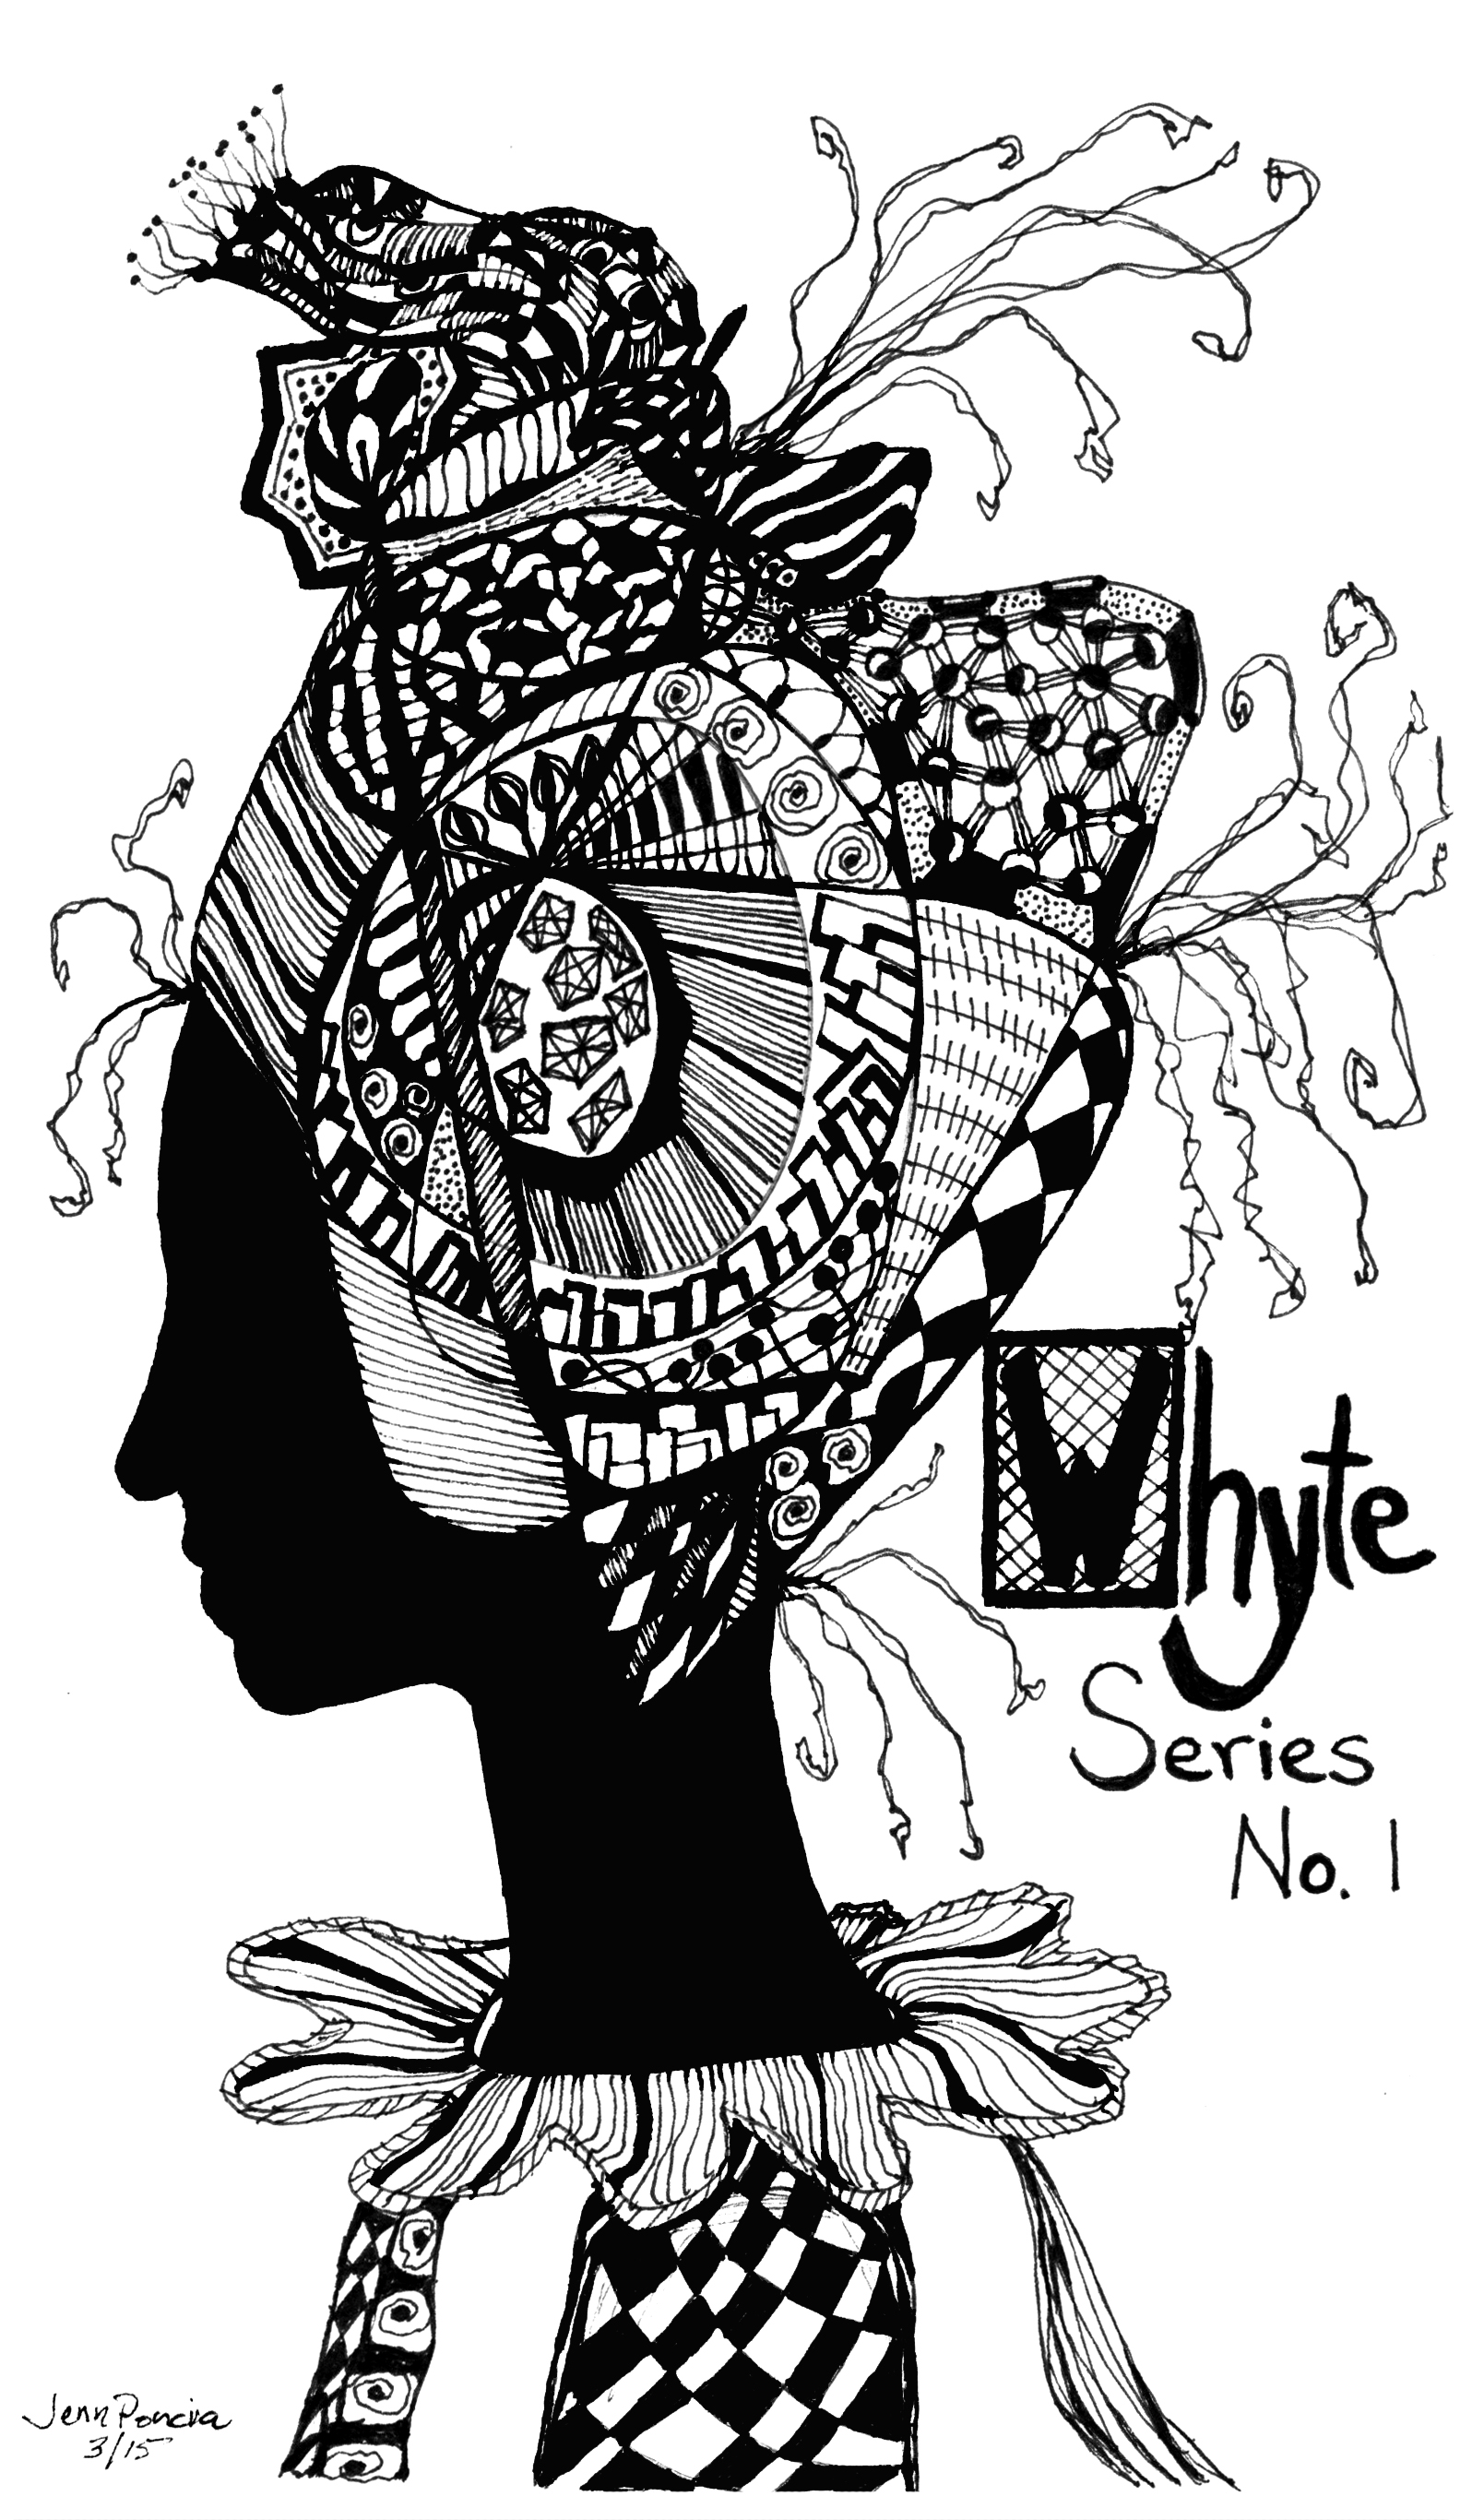 Whyte_series_one.jpg